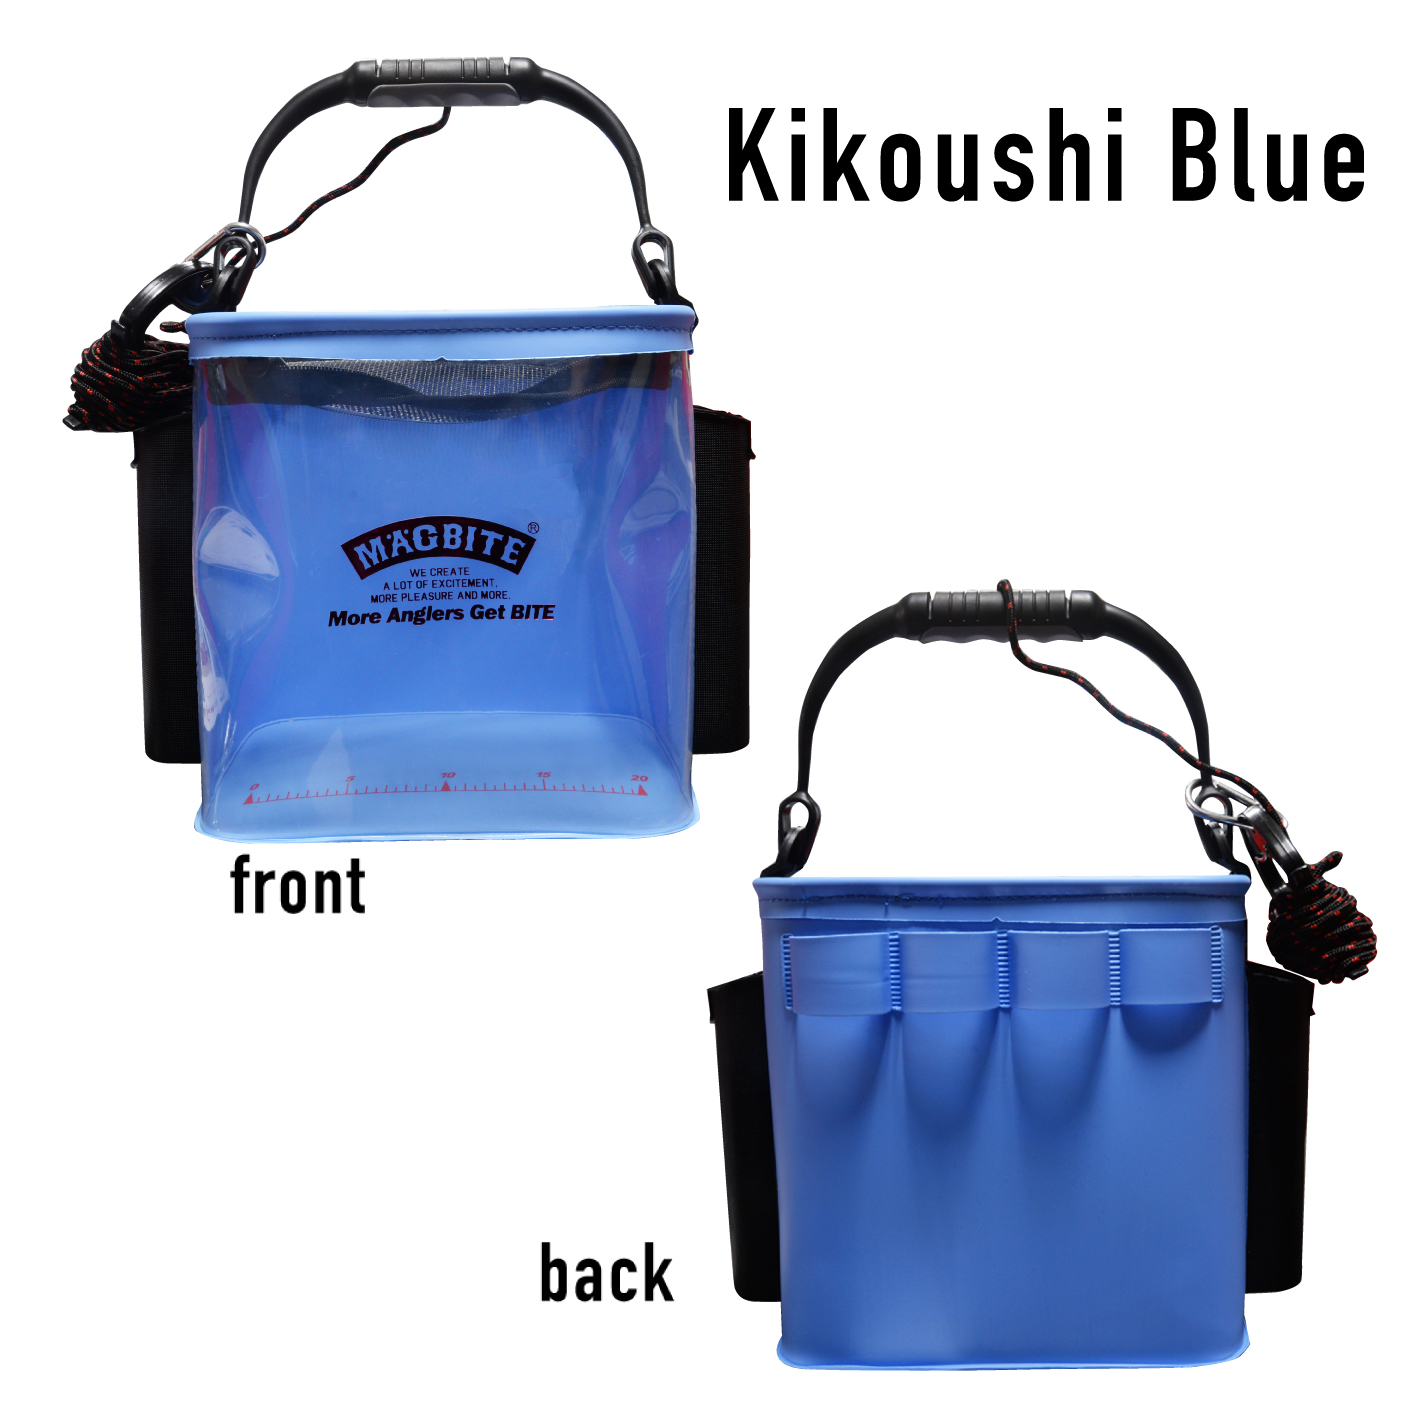 Kikoushi Blue